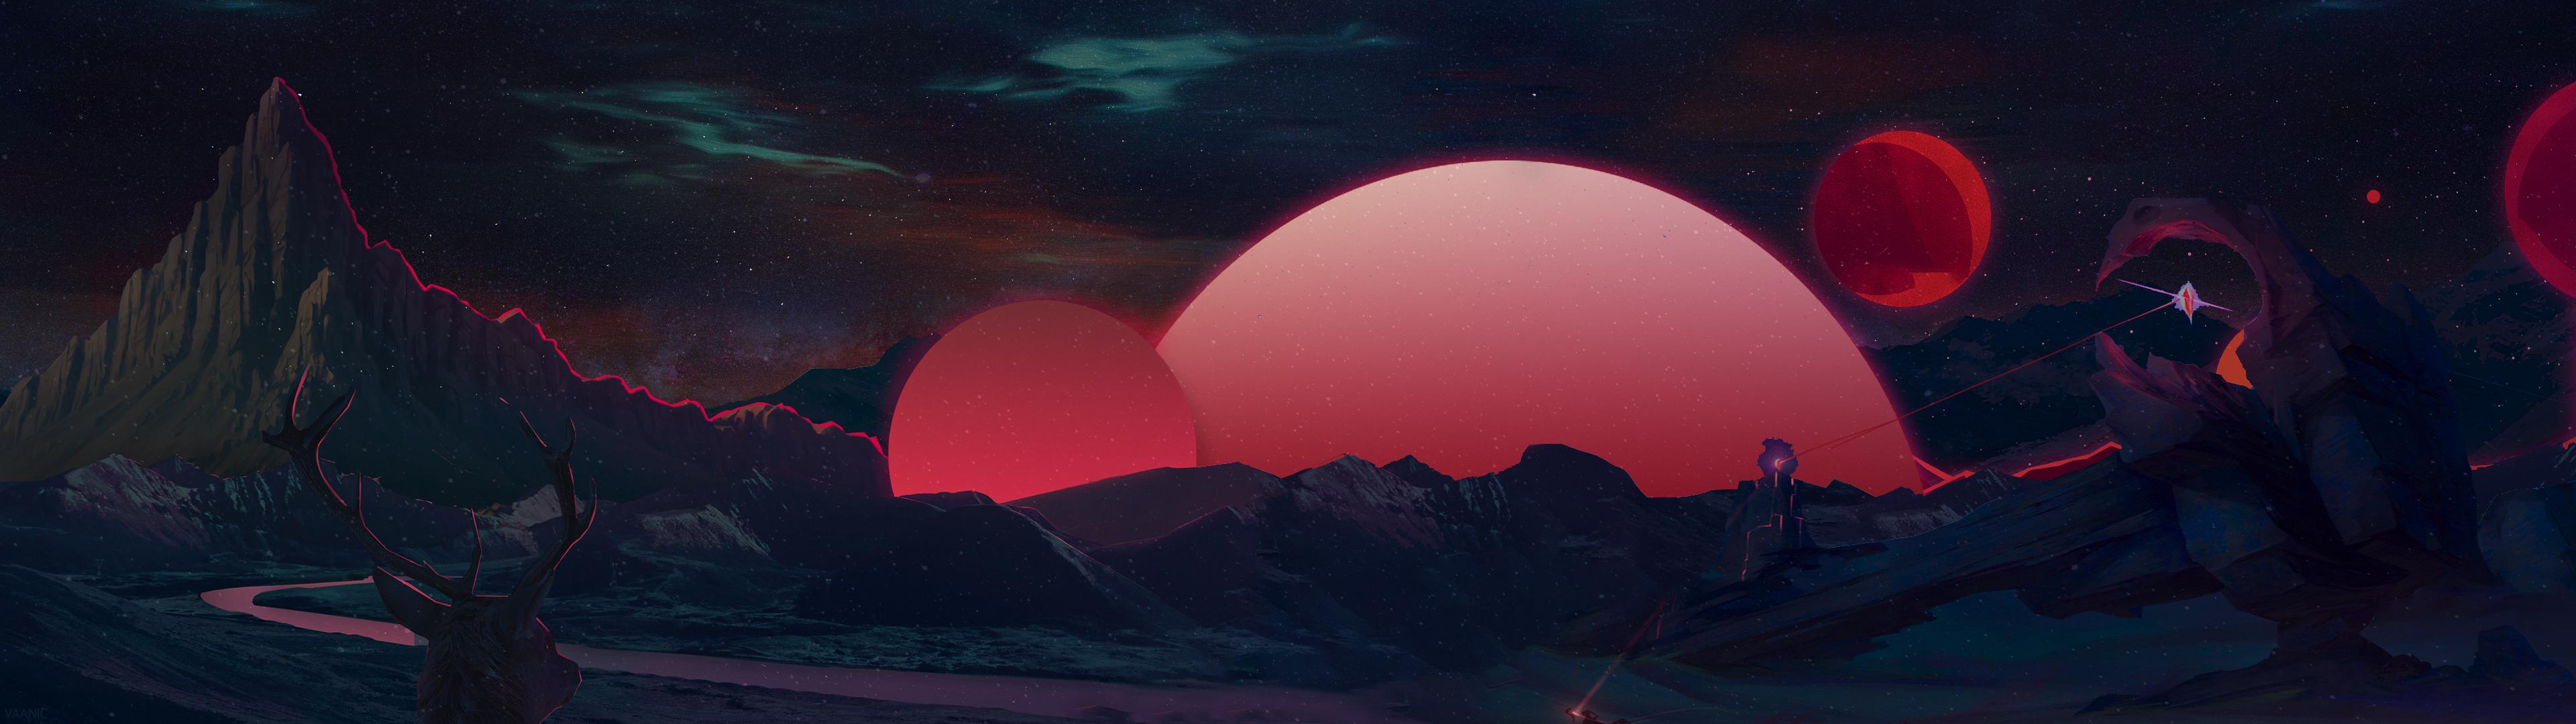 General 3840x1080 retrowave synthwave digital art planet sky dark